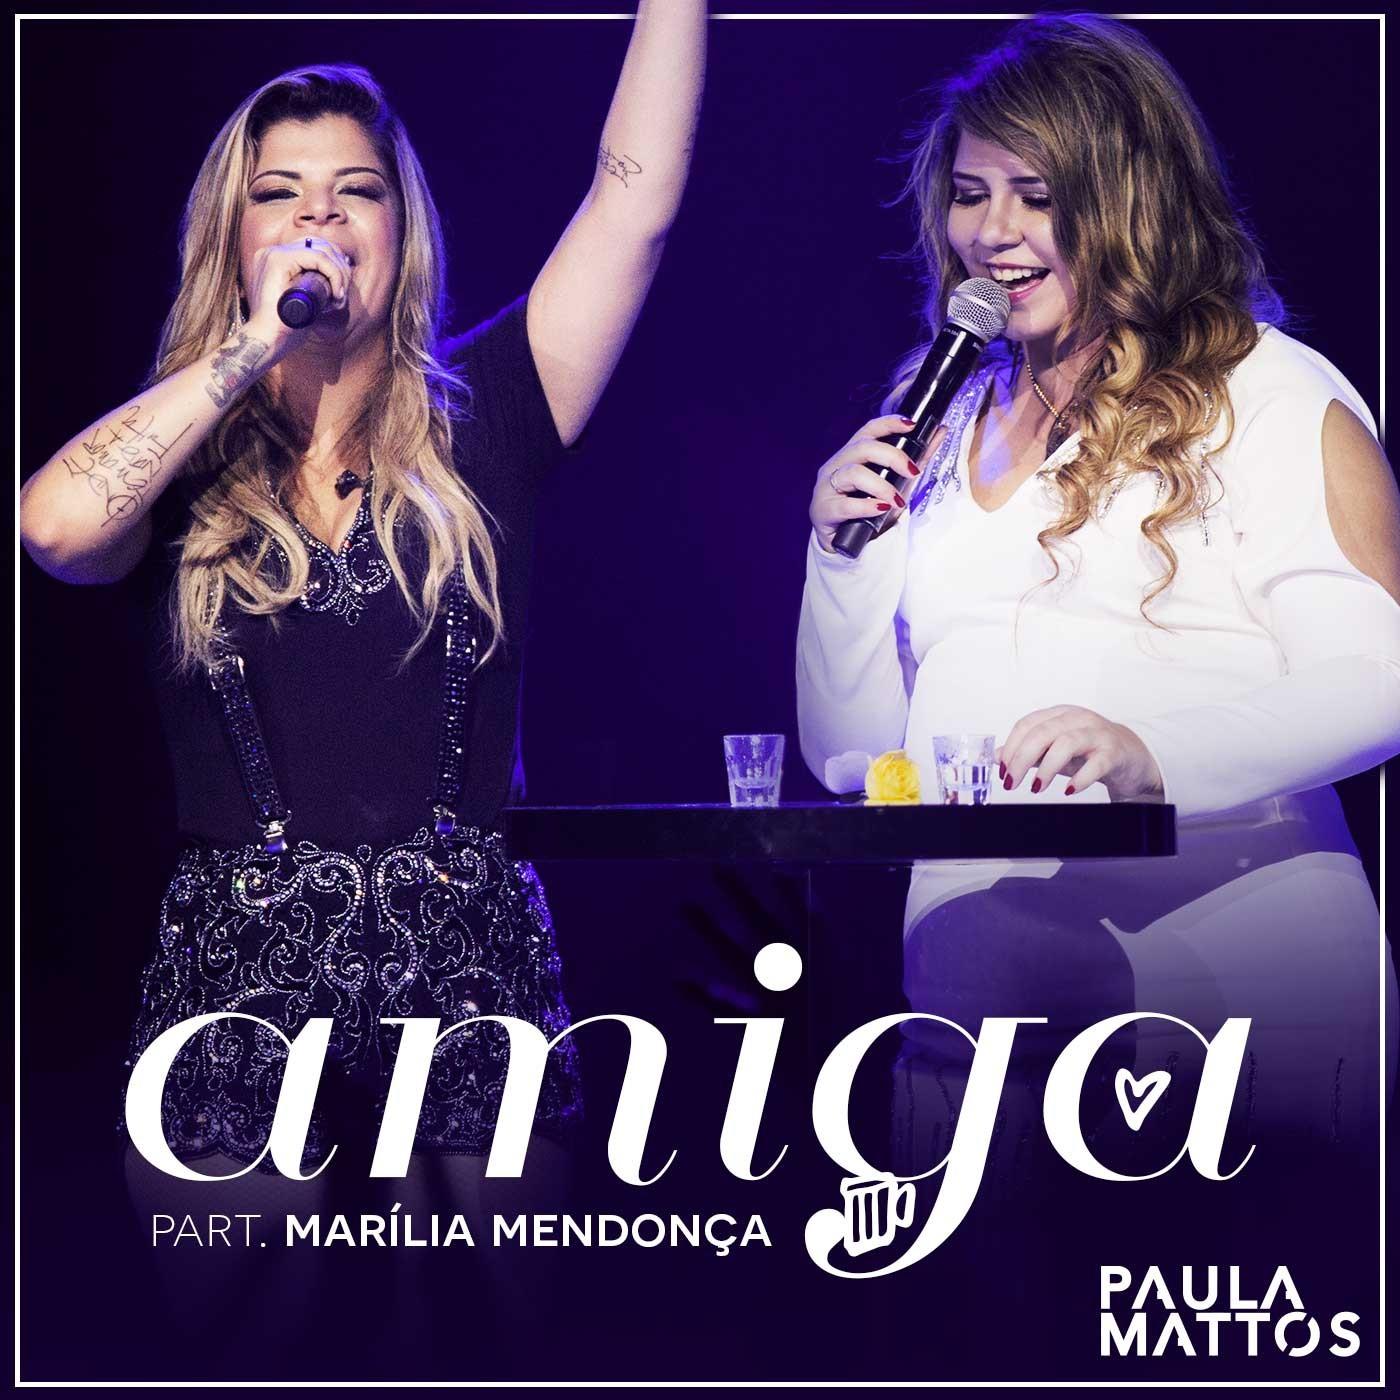 Paula Mattos e Marilia (Foto: divulgao)